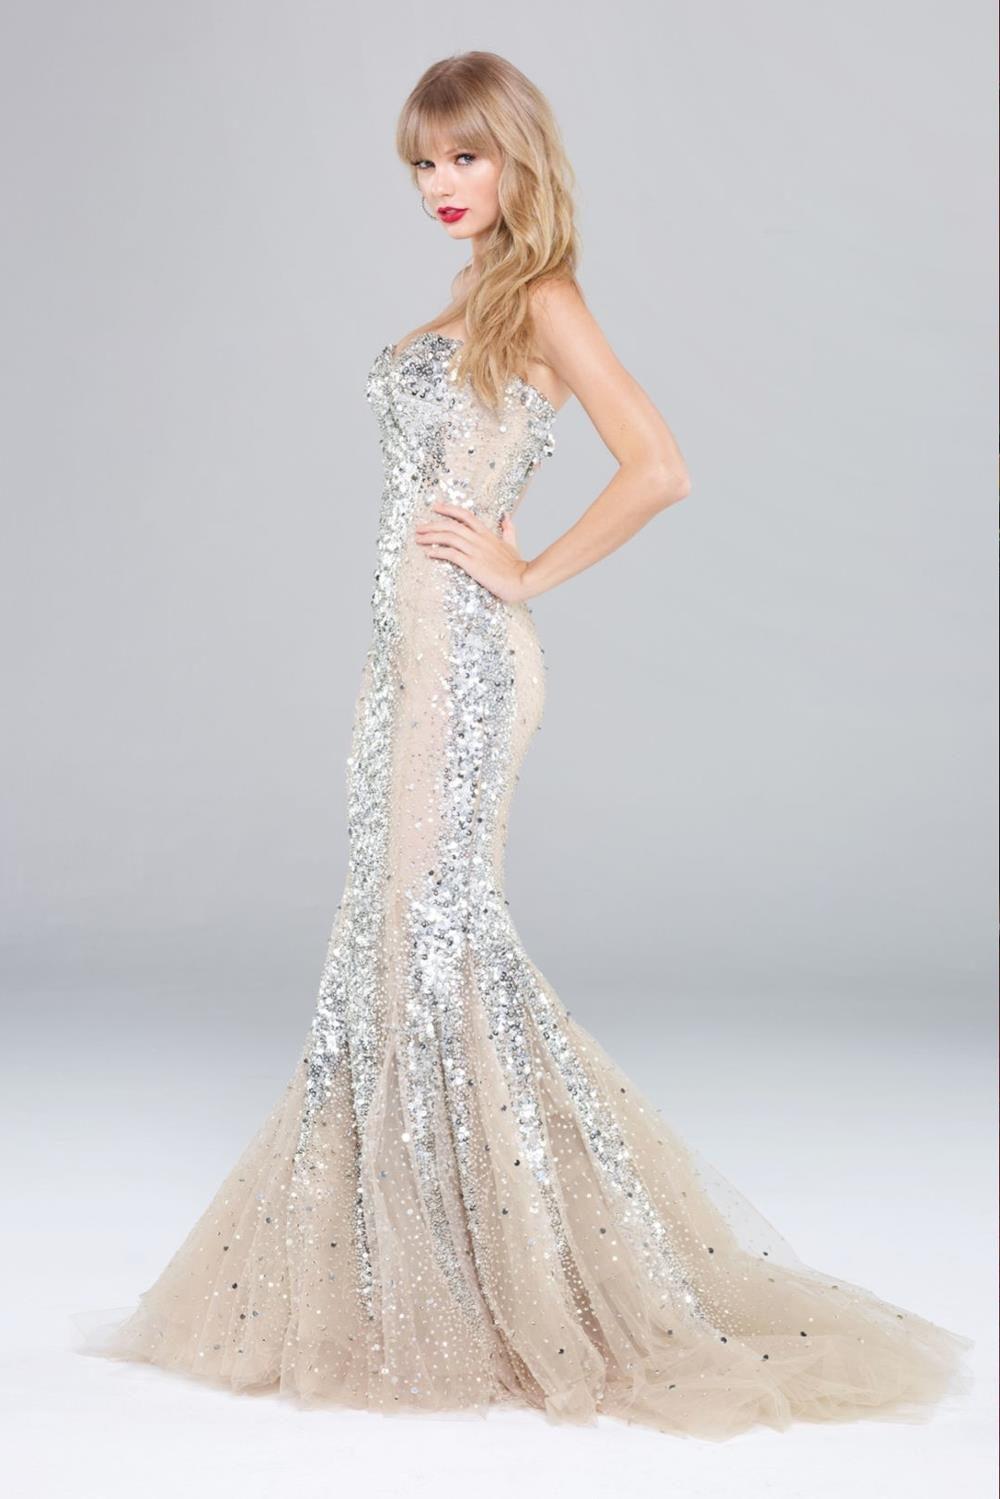 Beautiful dress glitter dress elegant the ball pinterest